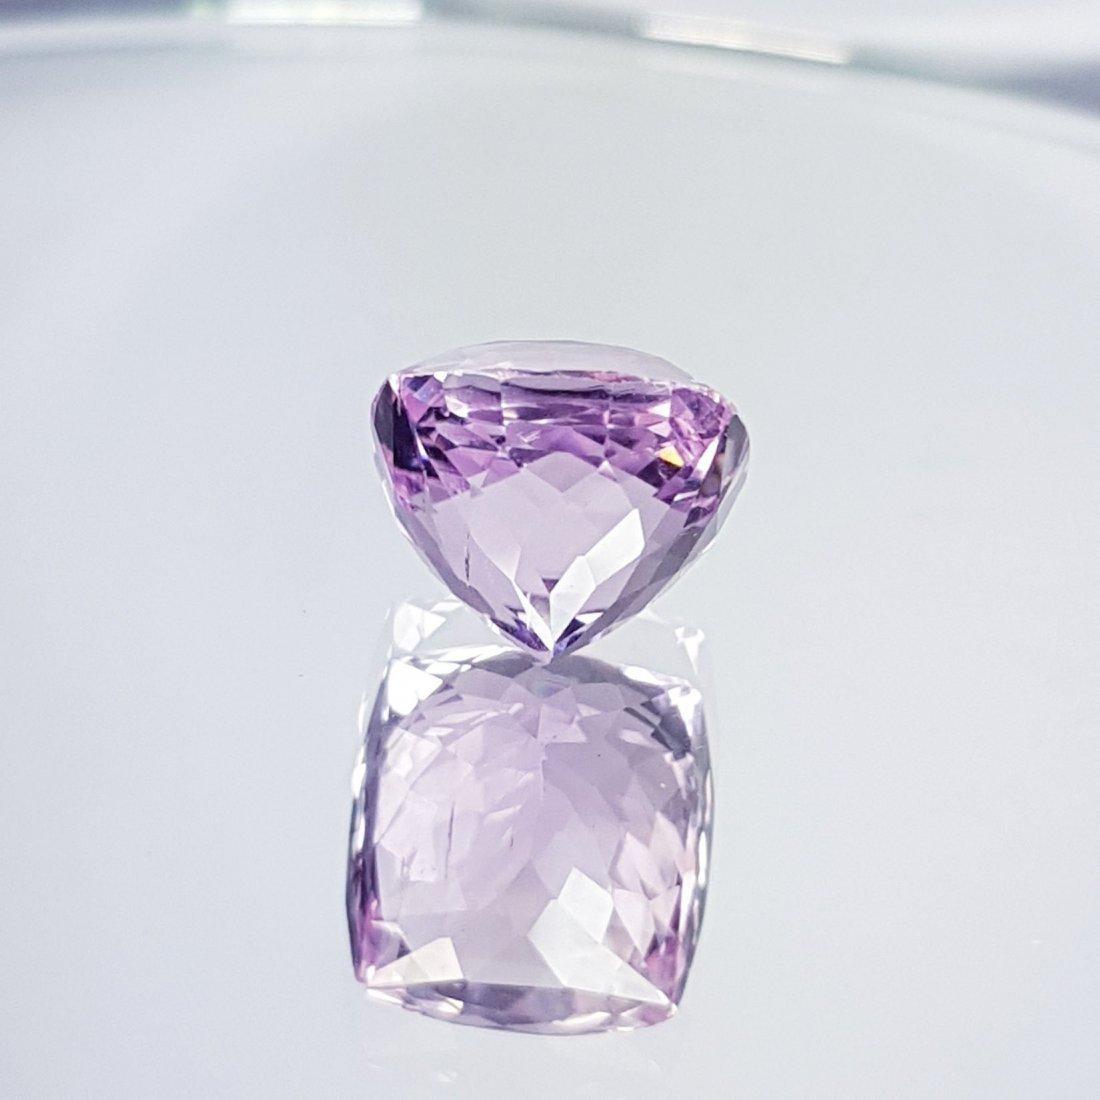 Pink Kunzite - 7.76 ct - 3